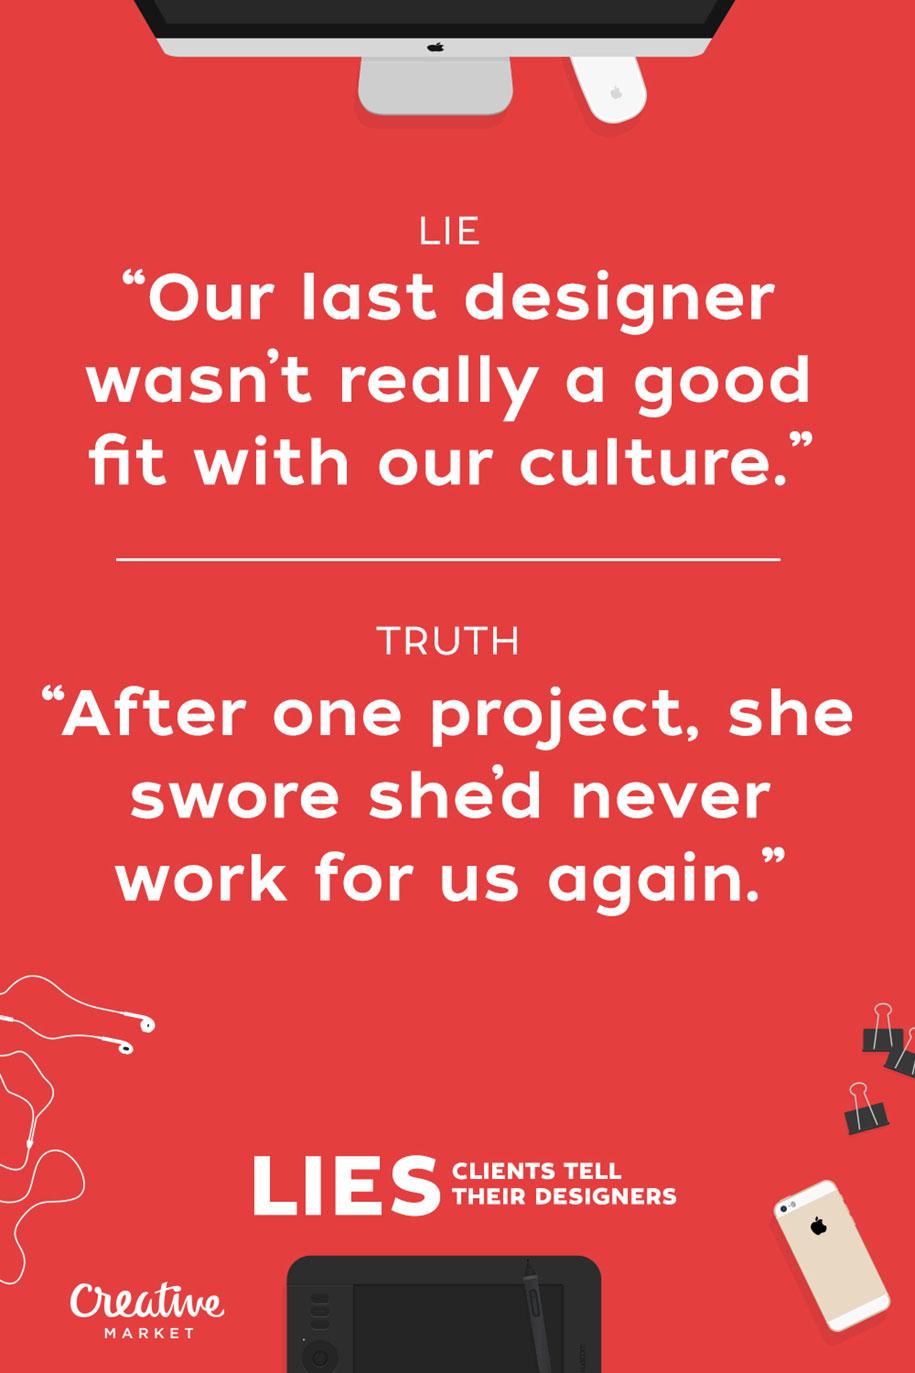 15-lies-clients-tell-designers-joshua-johnson-creative-market-2